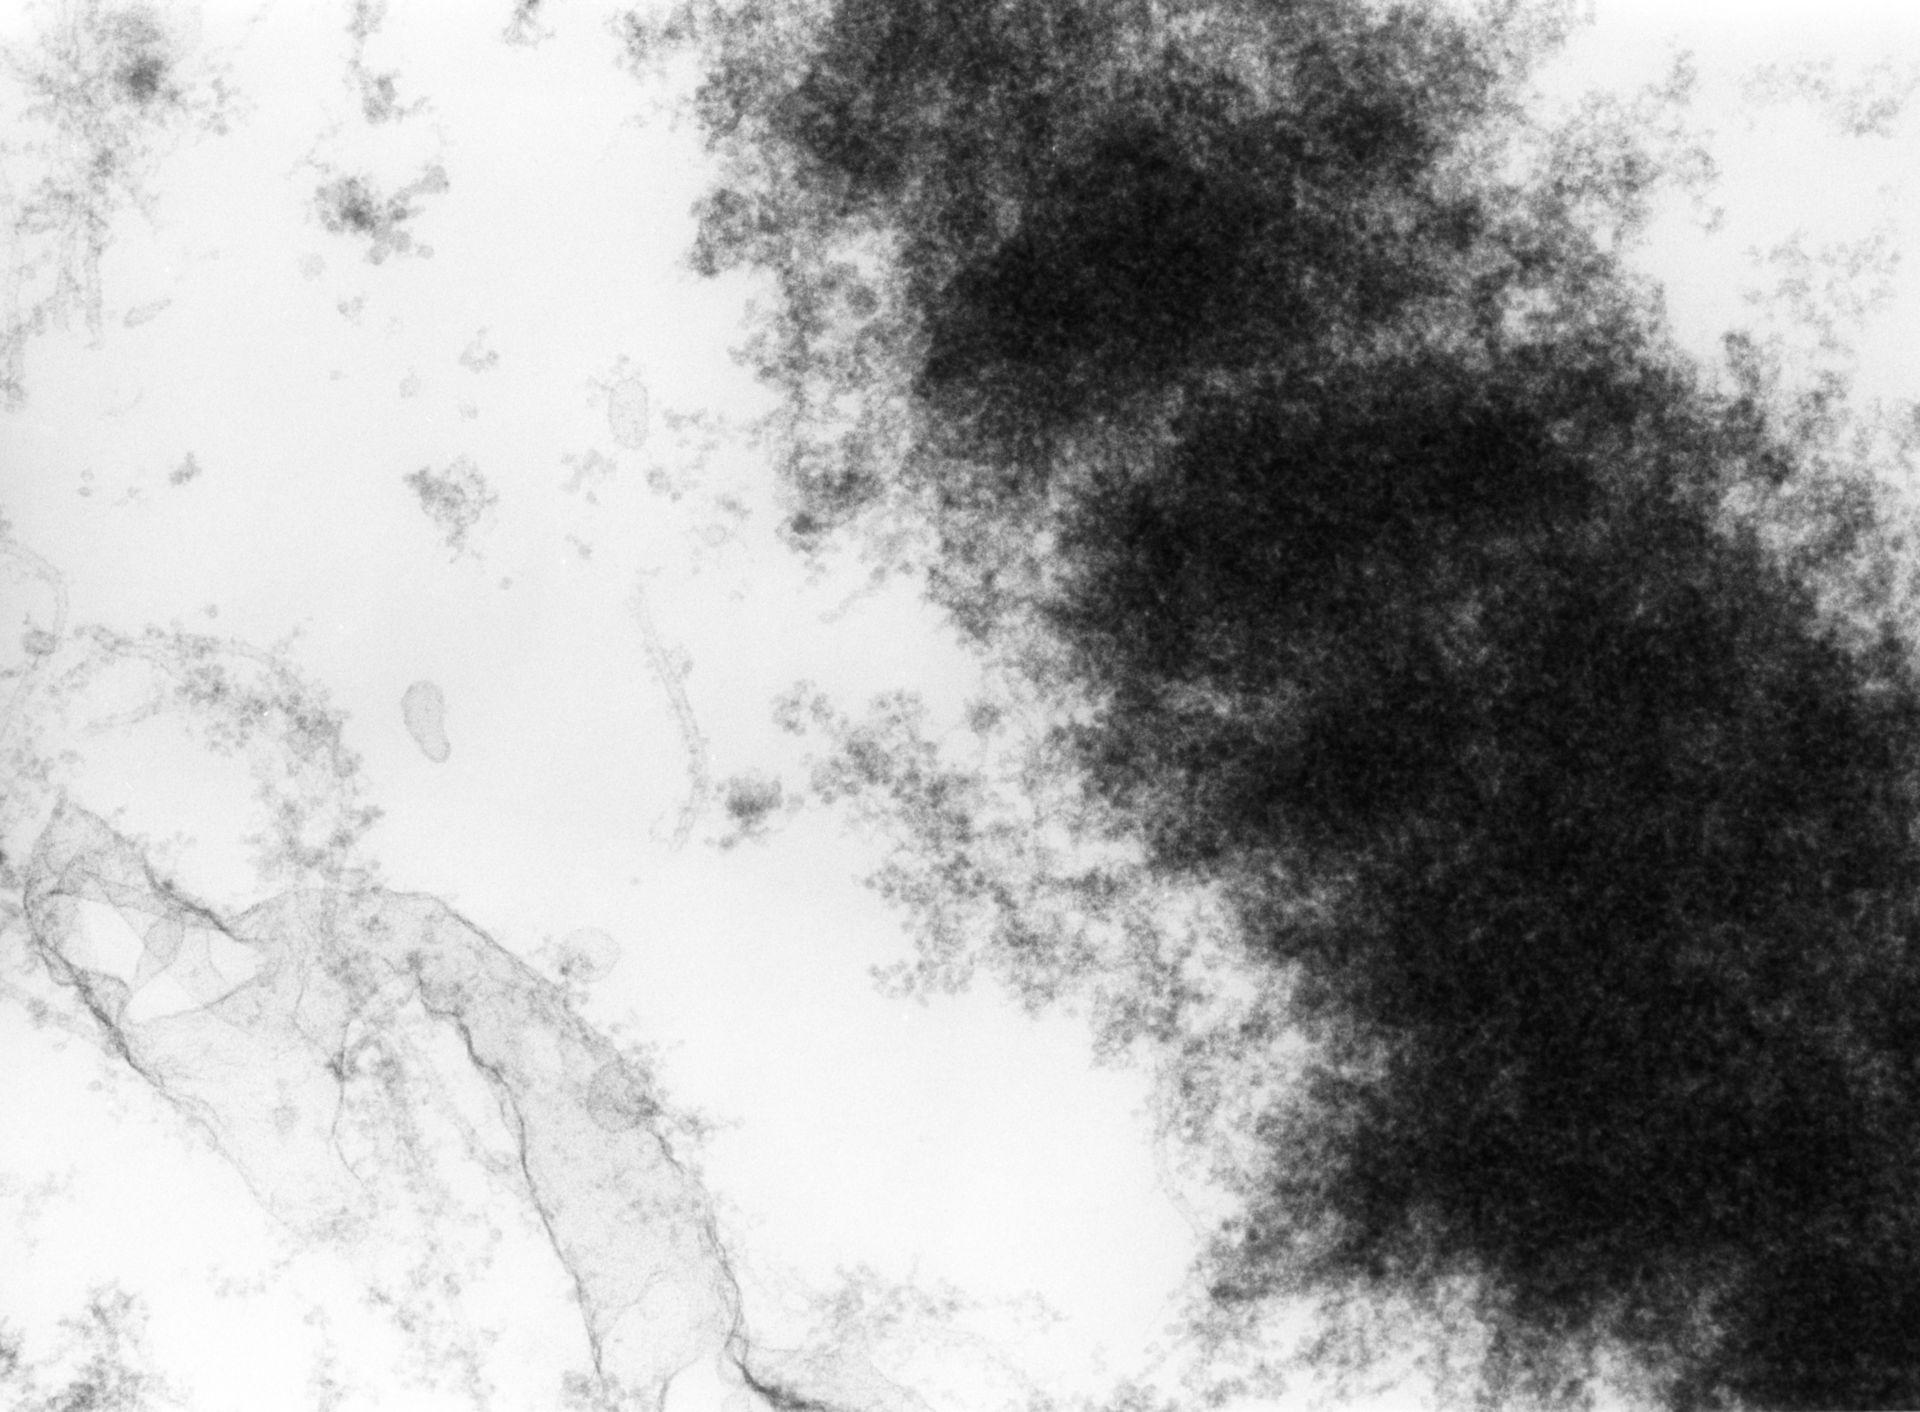 Haemanthus katharinae (Nuclear chromosome) - CIL:11906